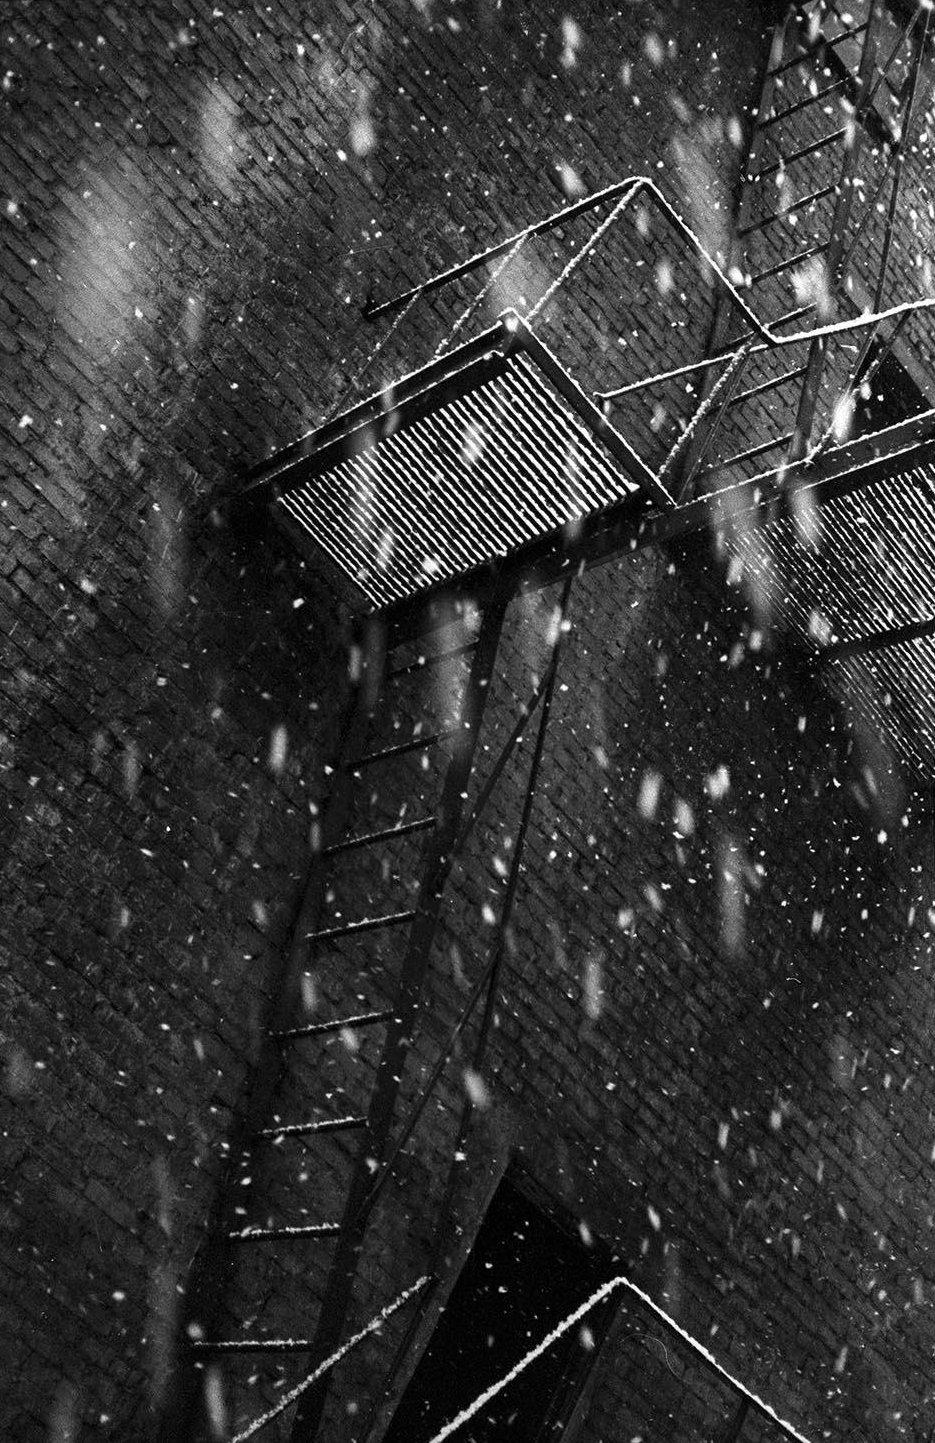 1960-е. Мокрый снег